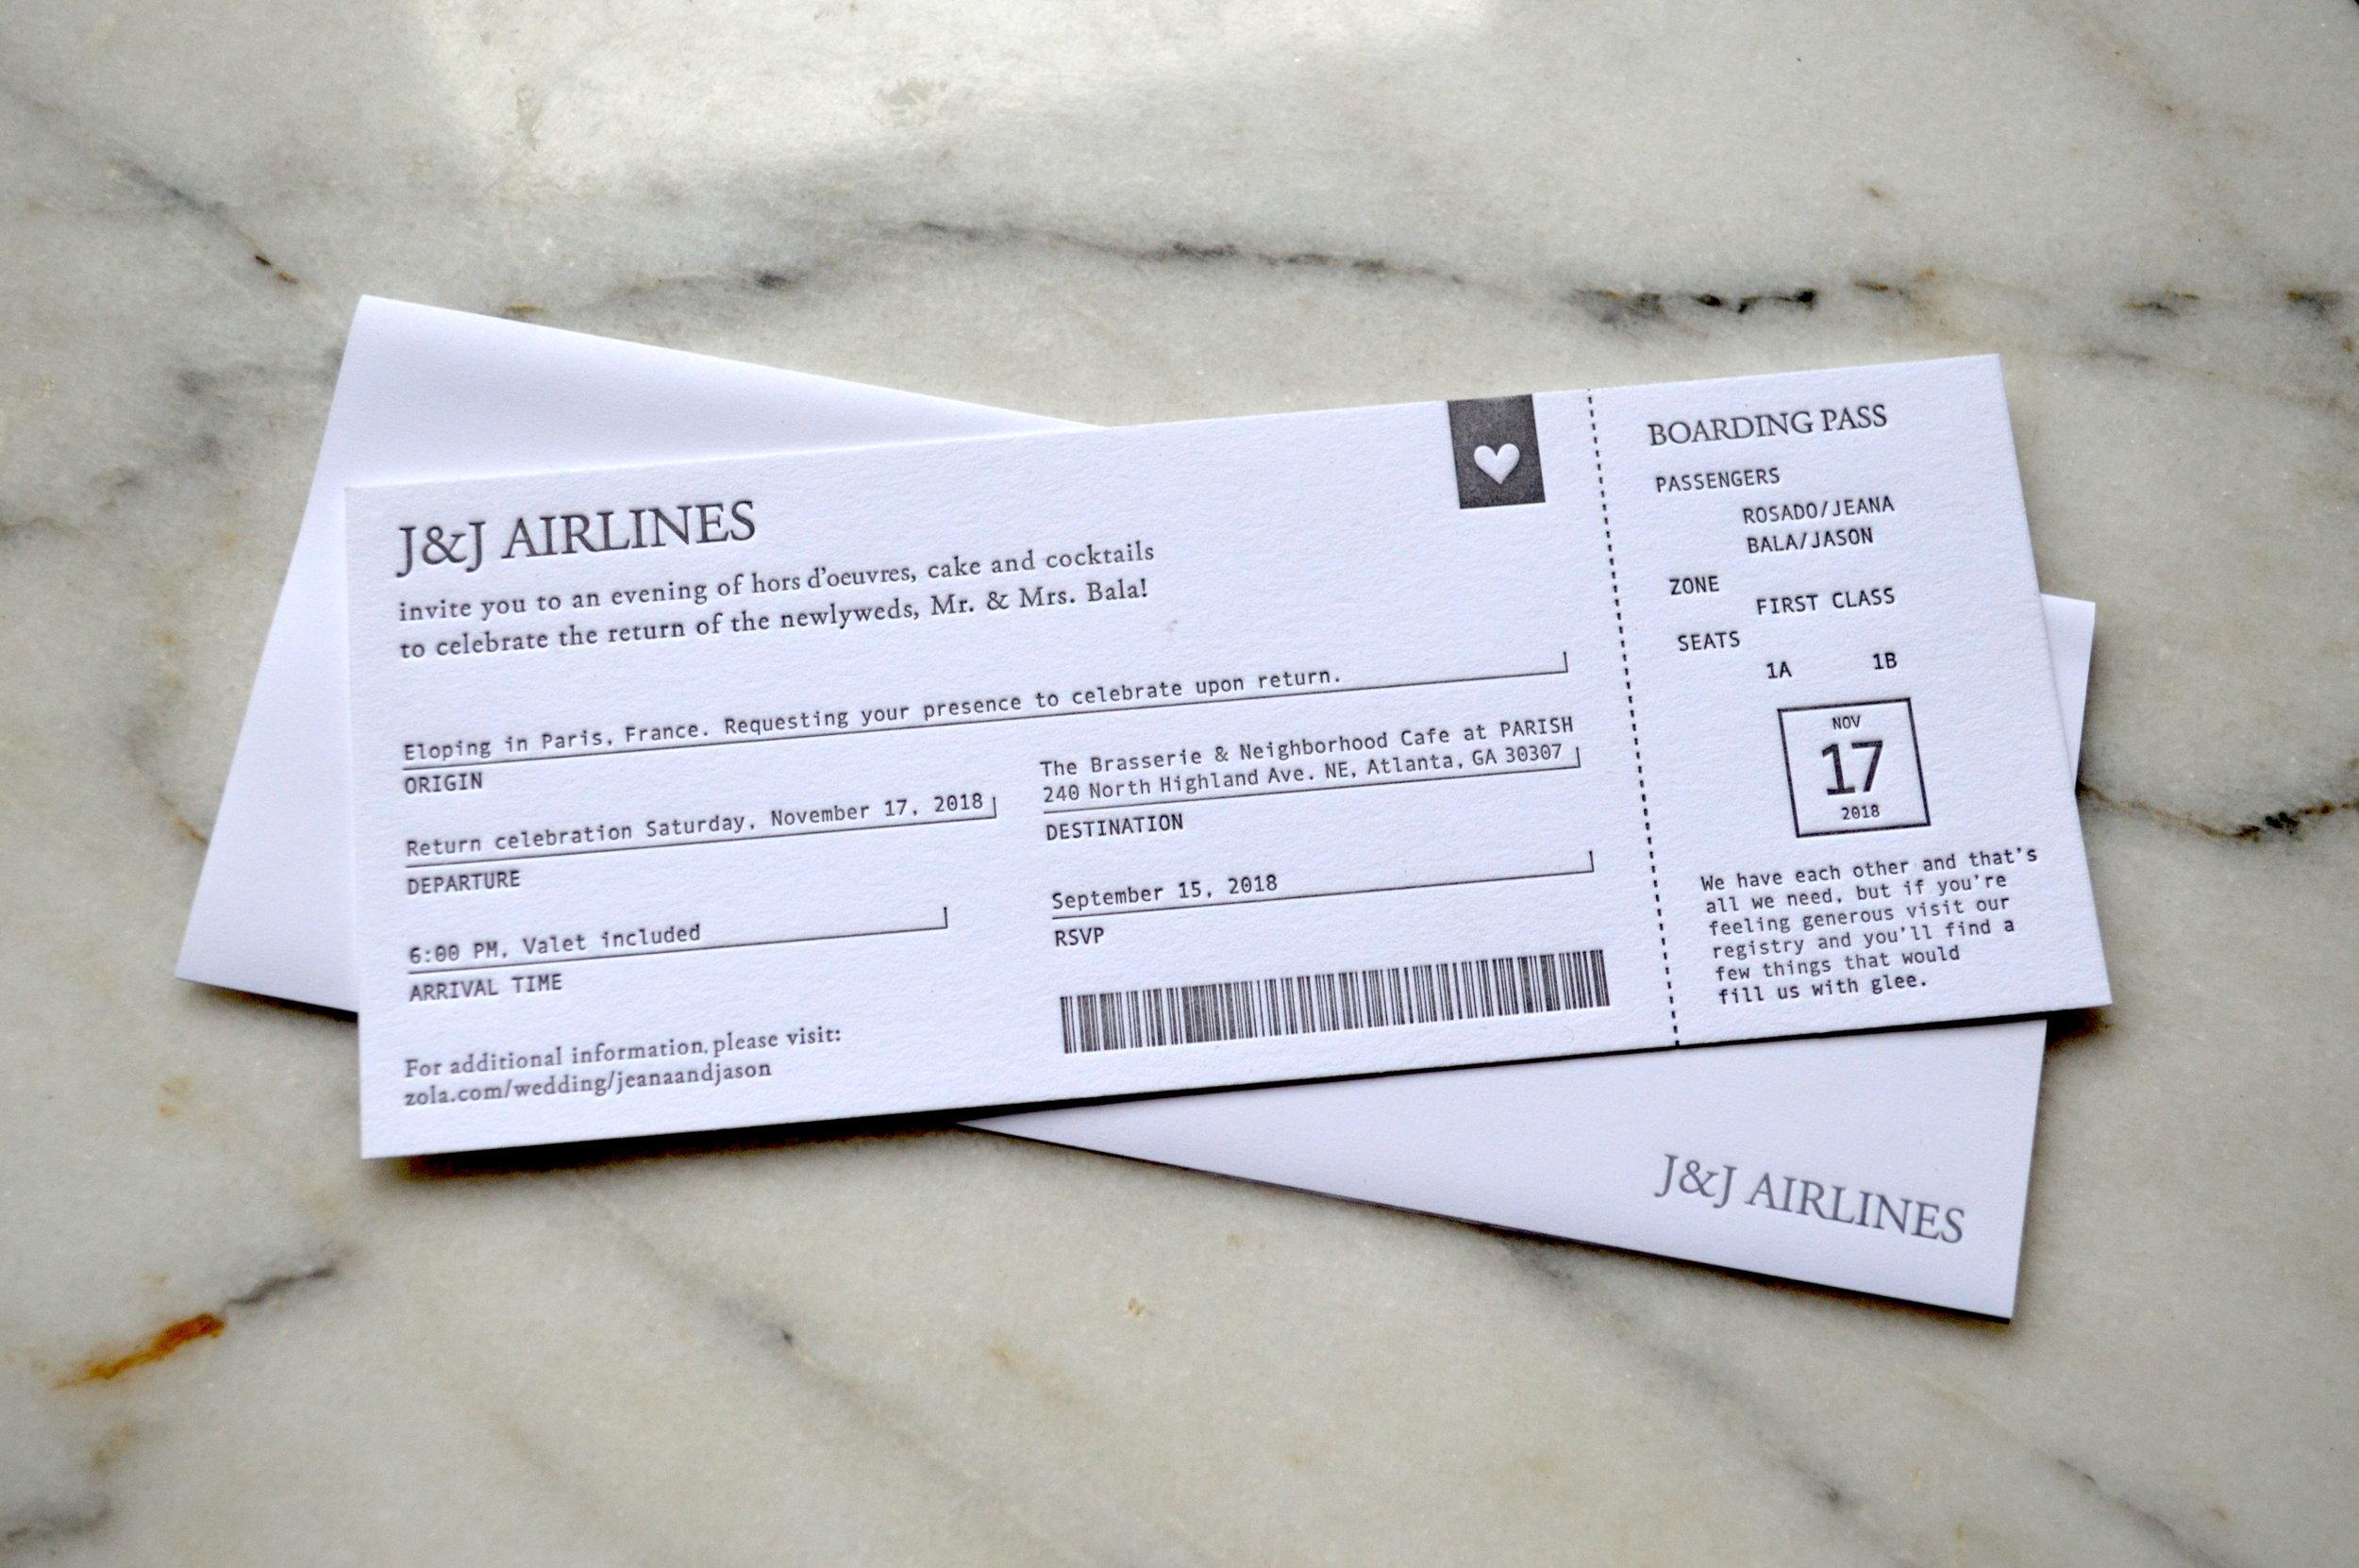 J&J Airlines.JPG